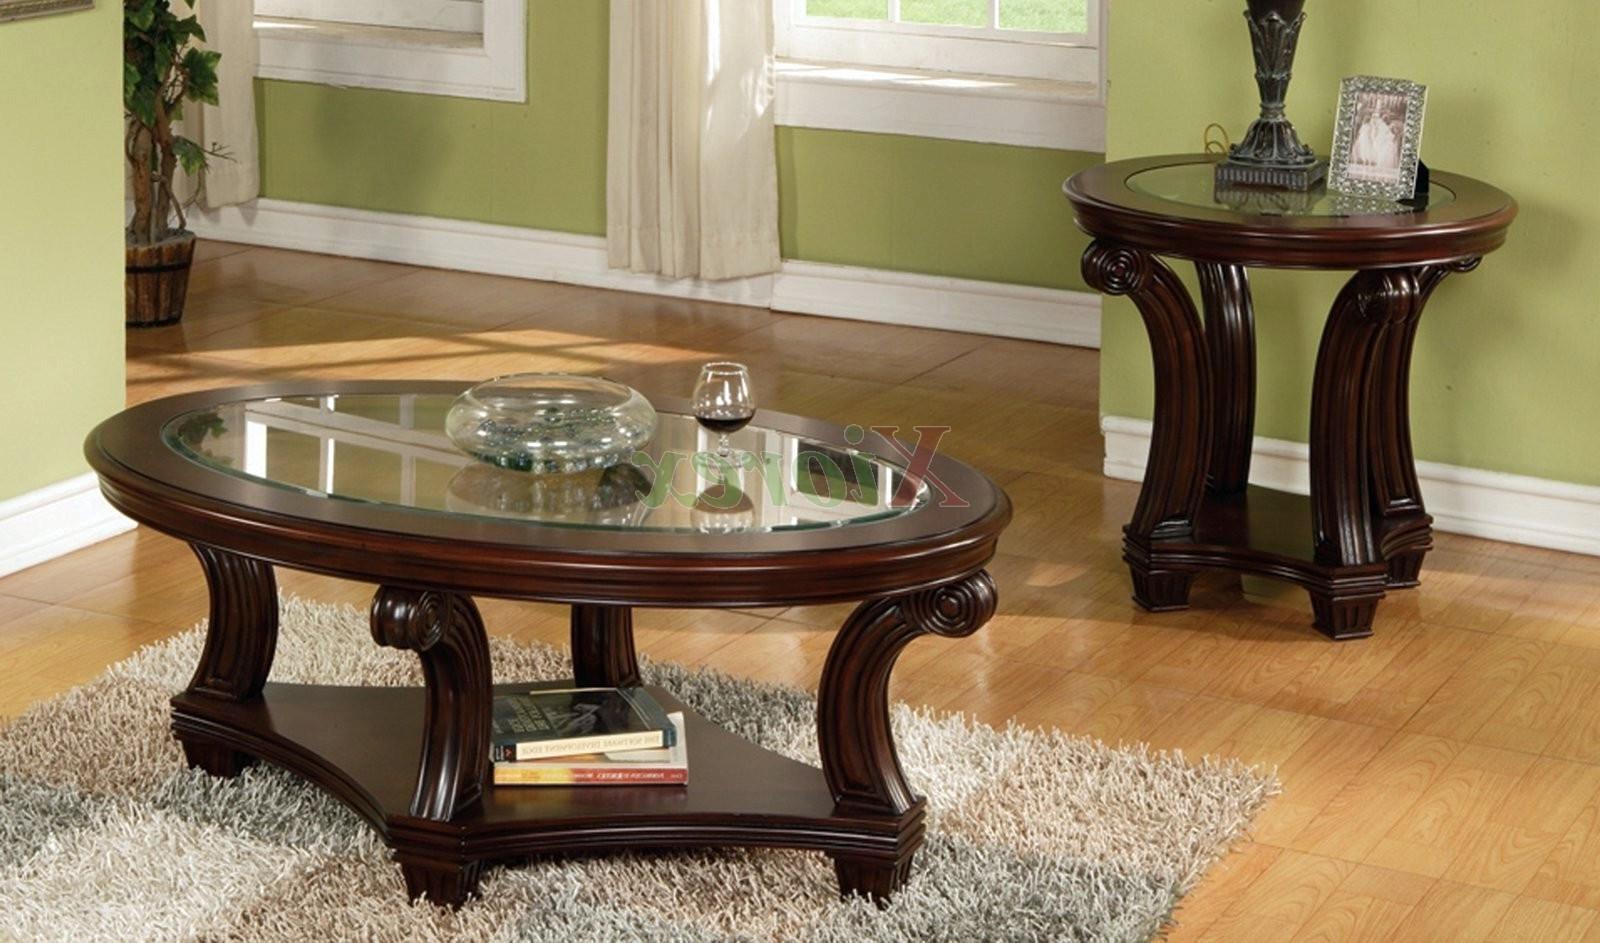 12 3 piece living room glass table set modern house 3 piece